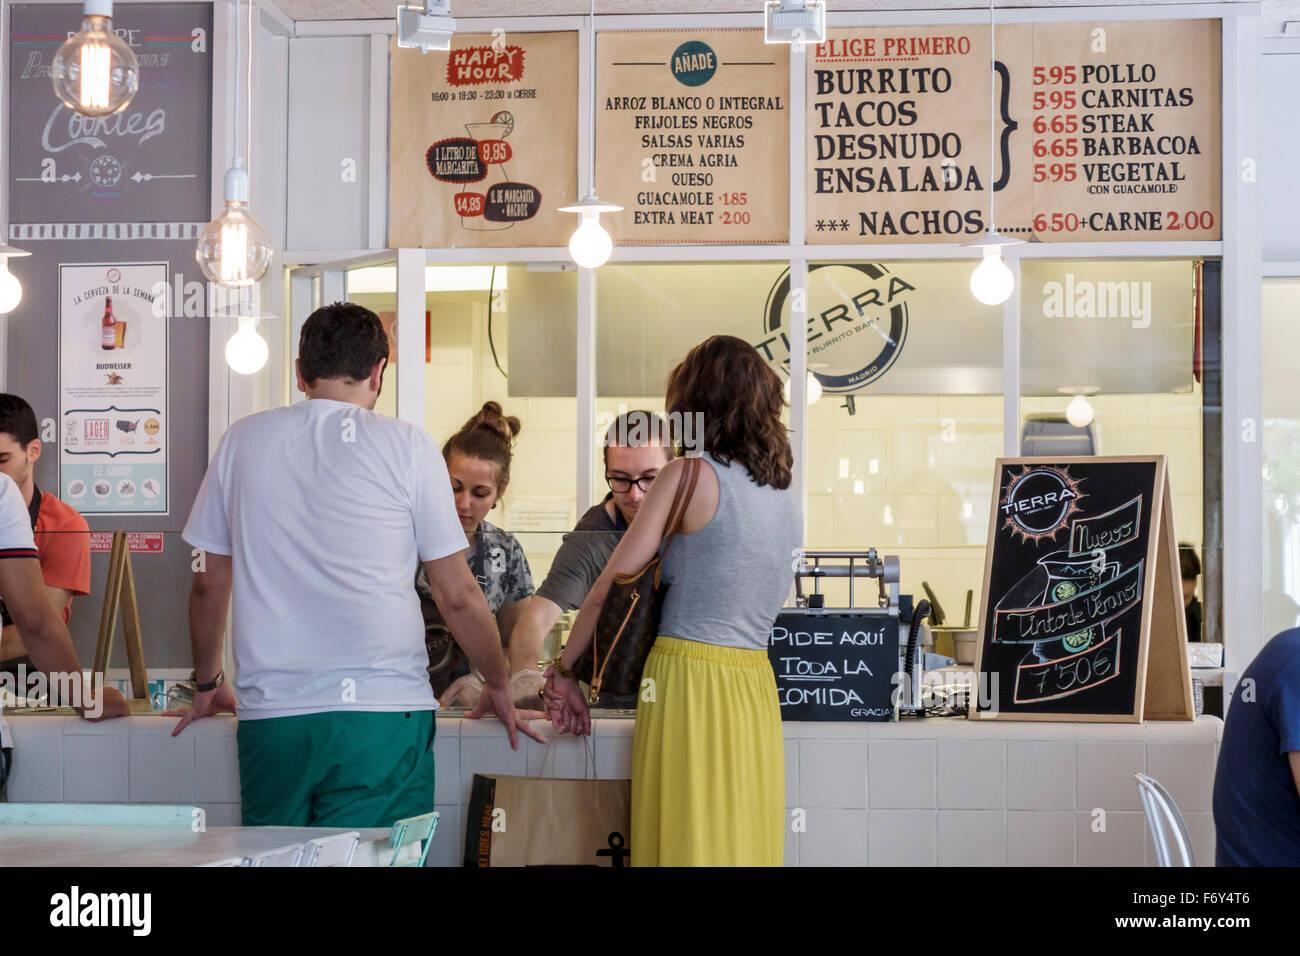 Tierra Burrito Bar Stockfotos & Tierra Burrito Bar Bilder - Alamy